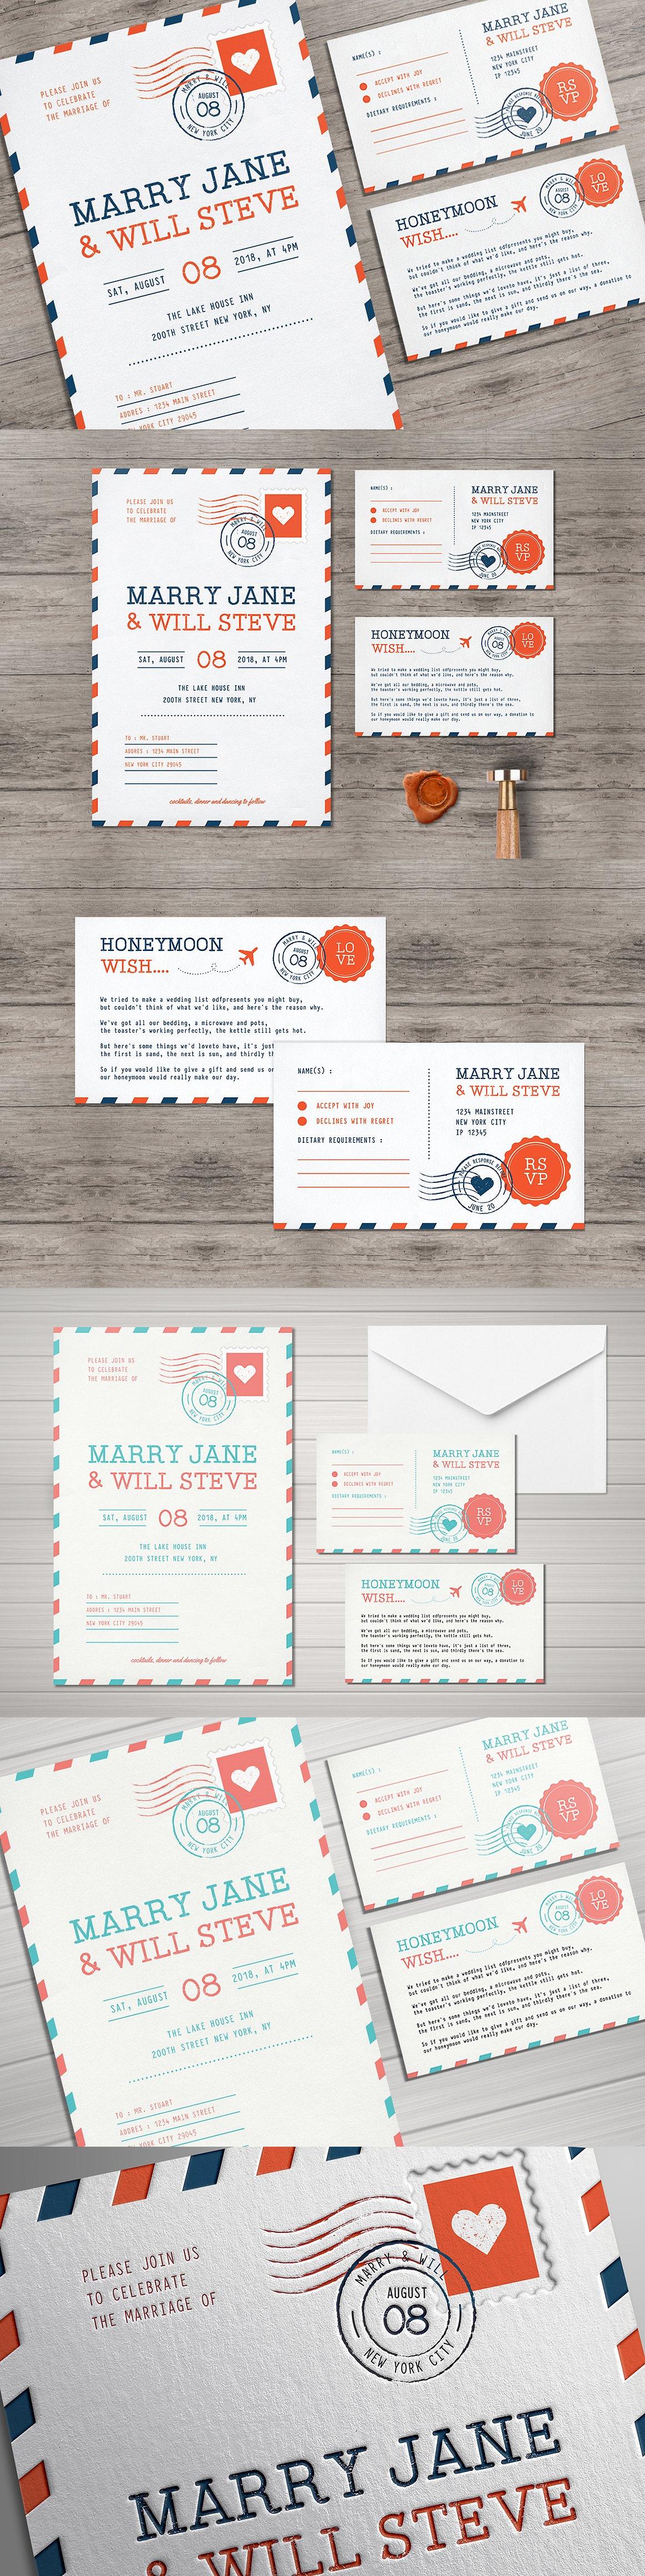 Airmail Wedding Invitation Template PSD